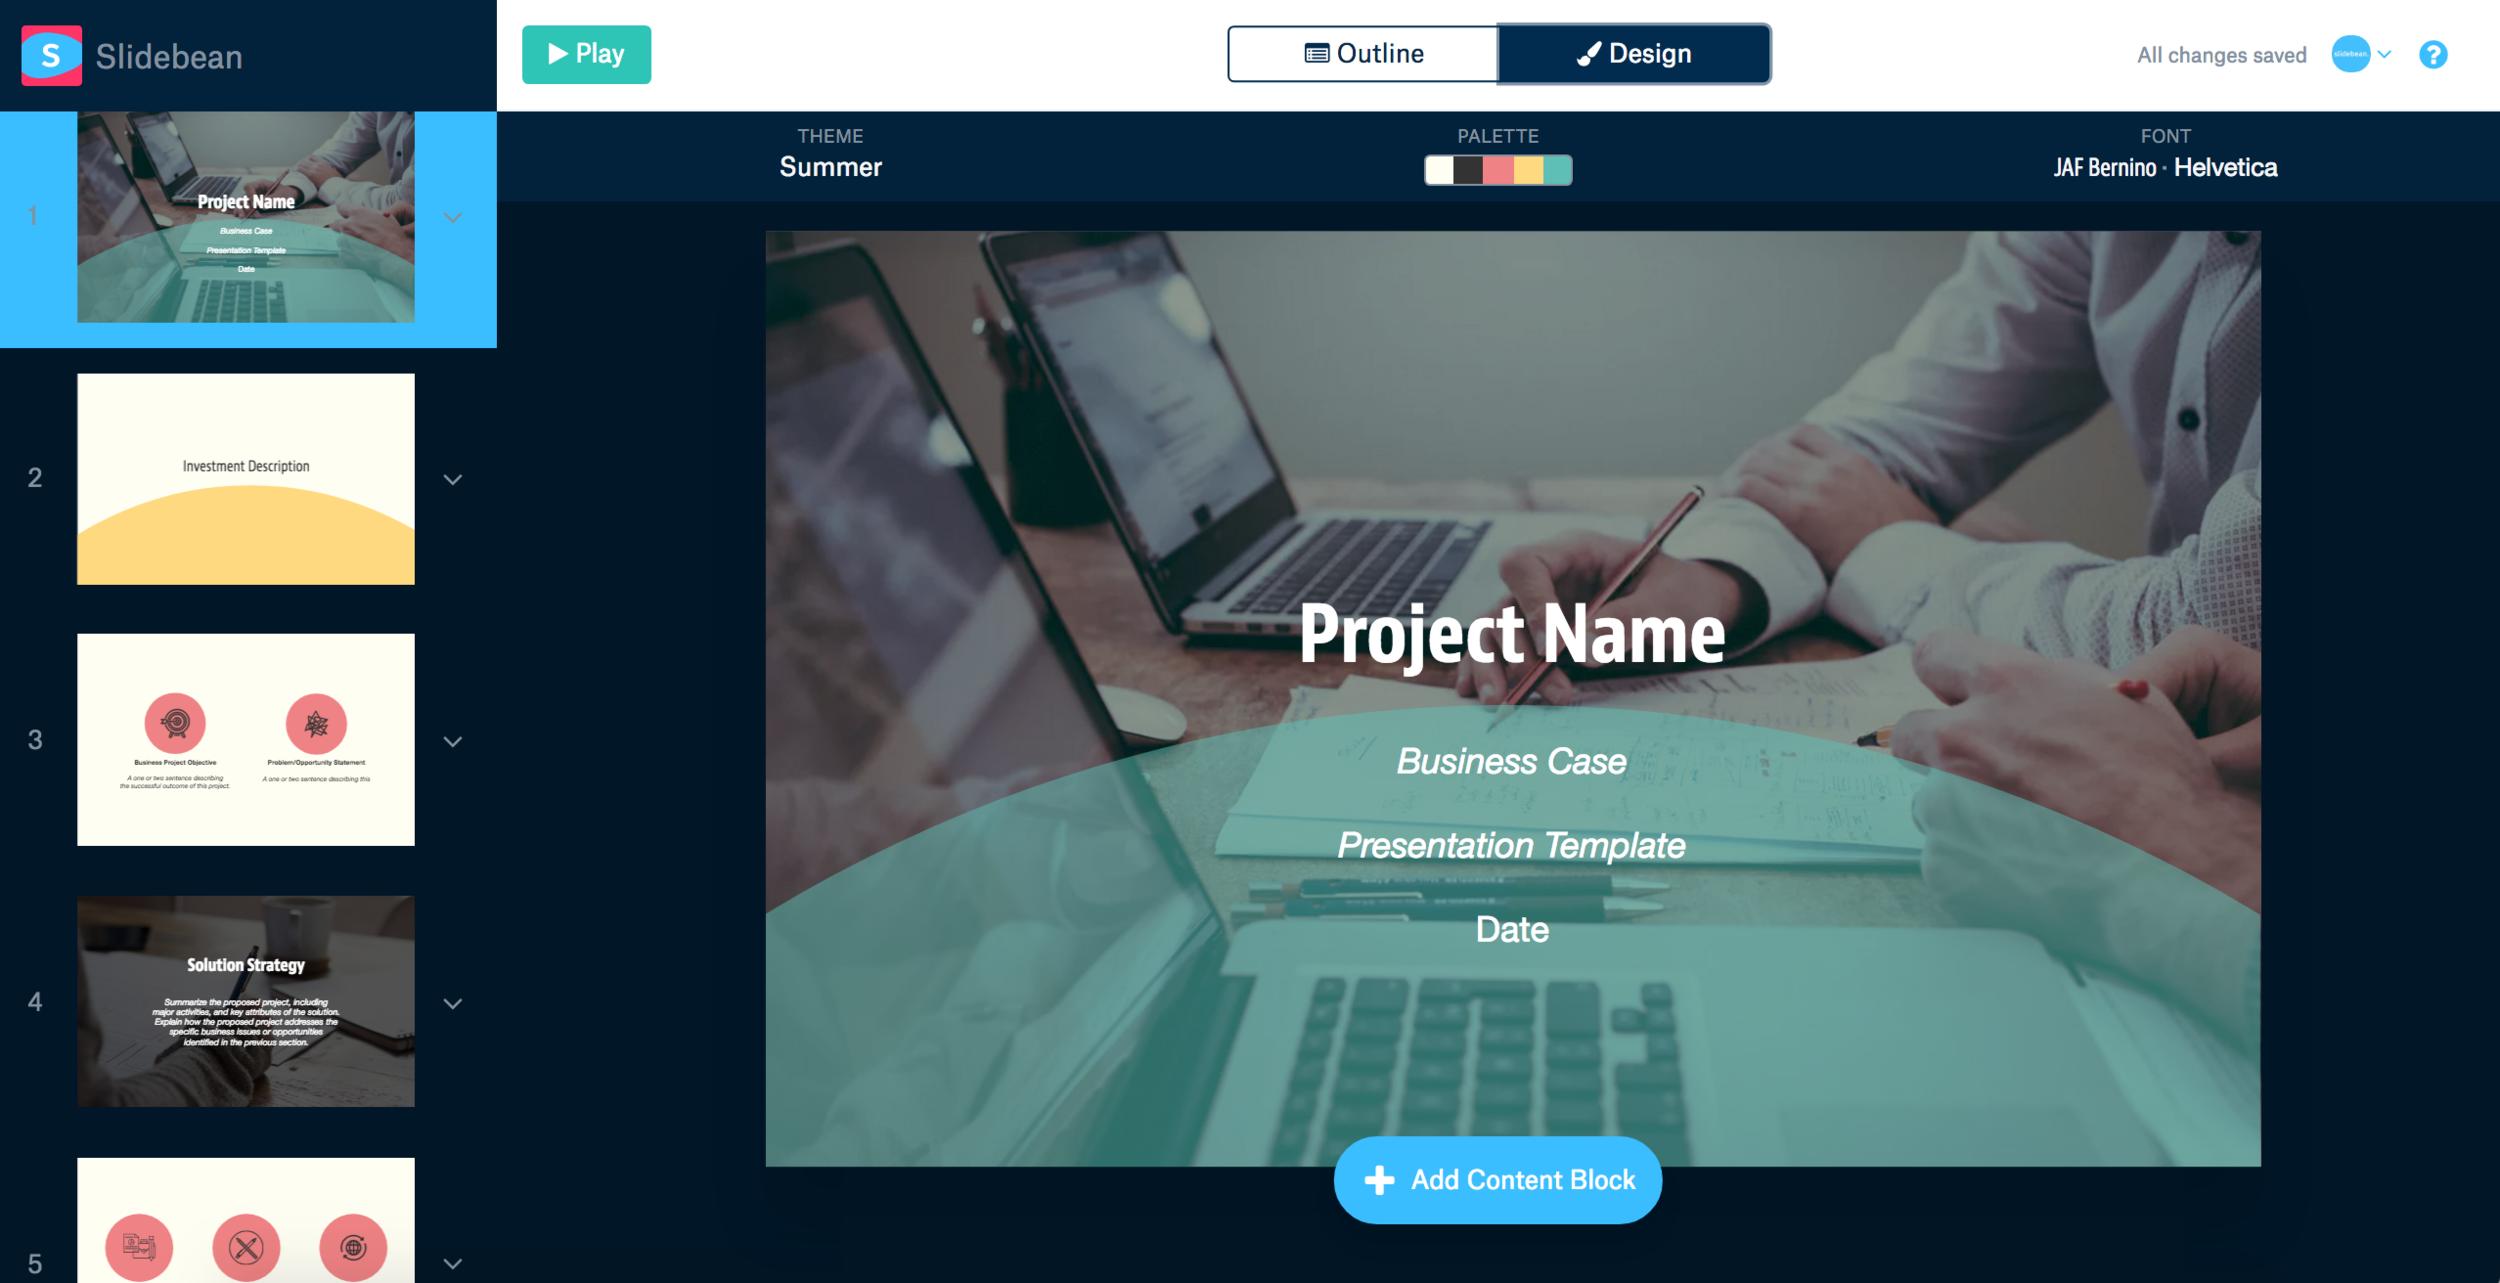 best pitch deck software, slidebean presentation tool